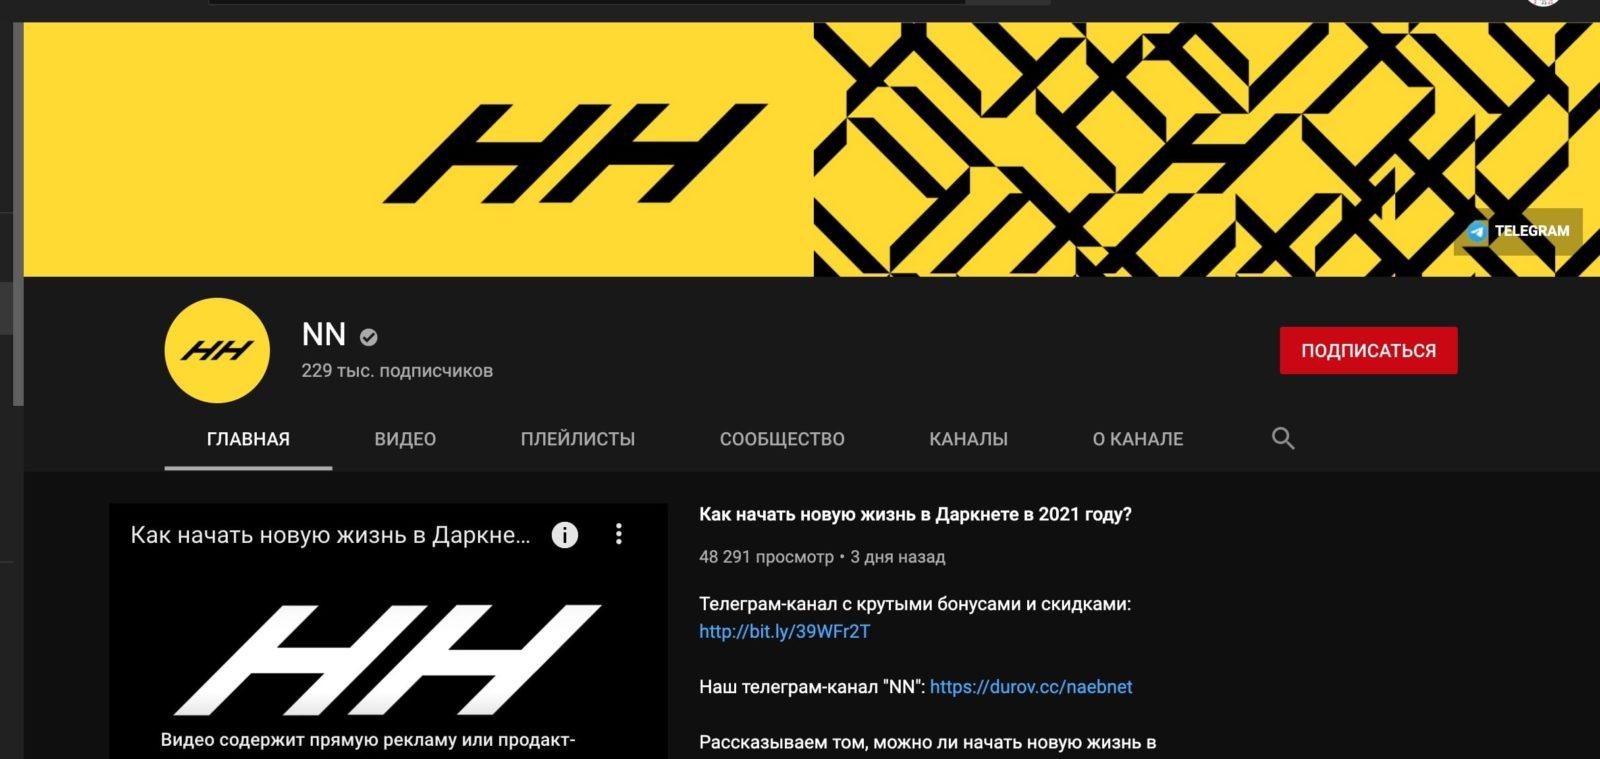 Ютуб канал NaebNet (Наебнет)